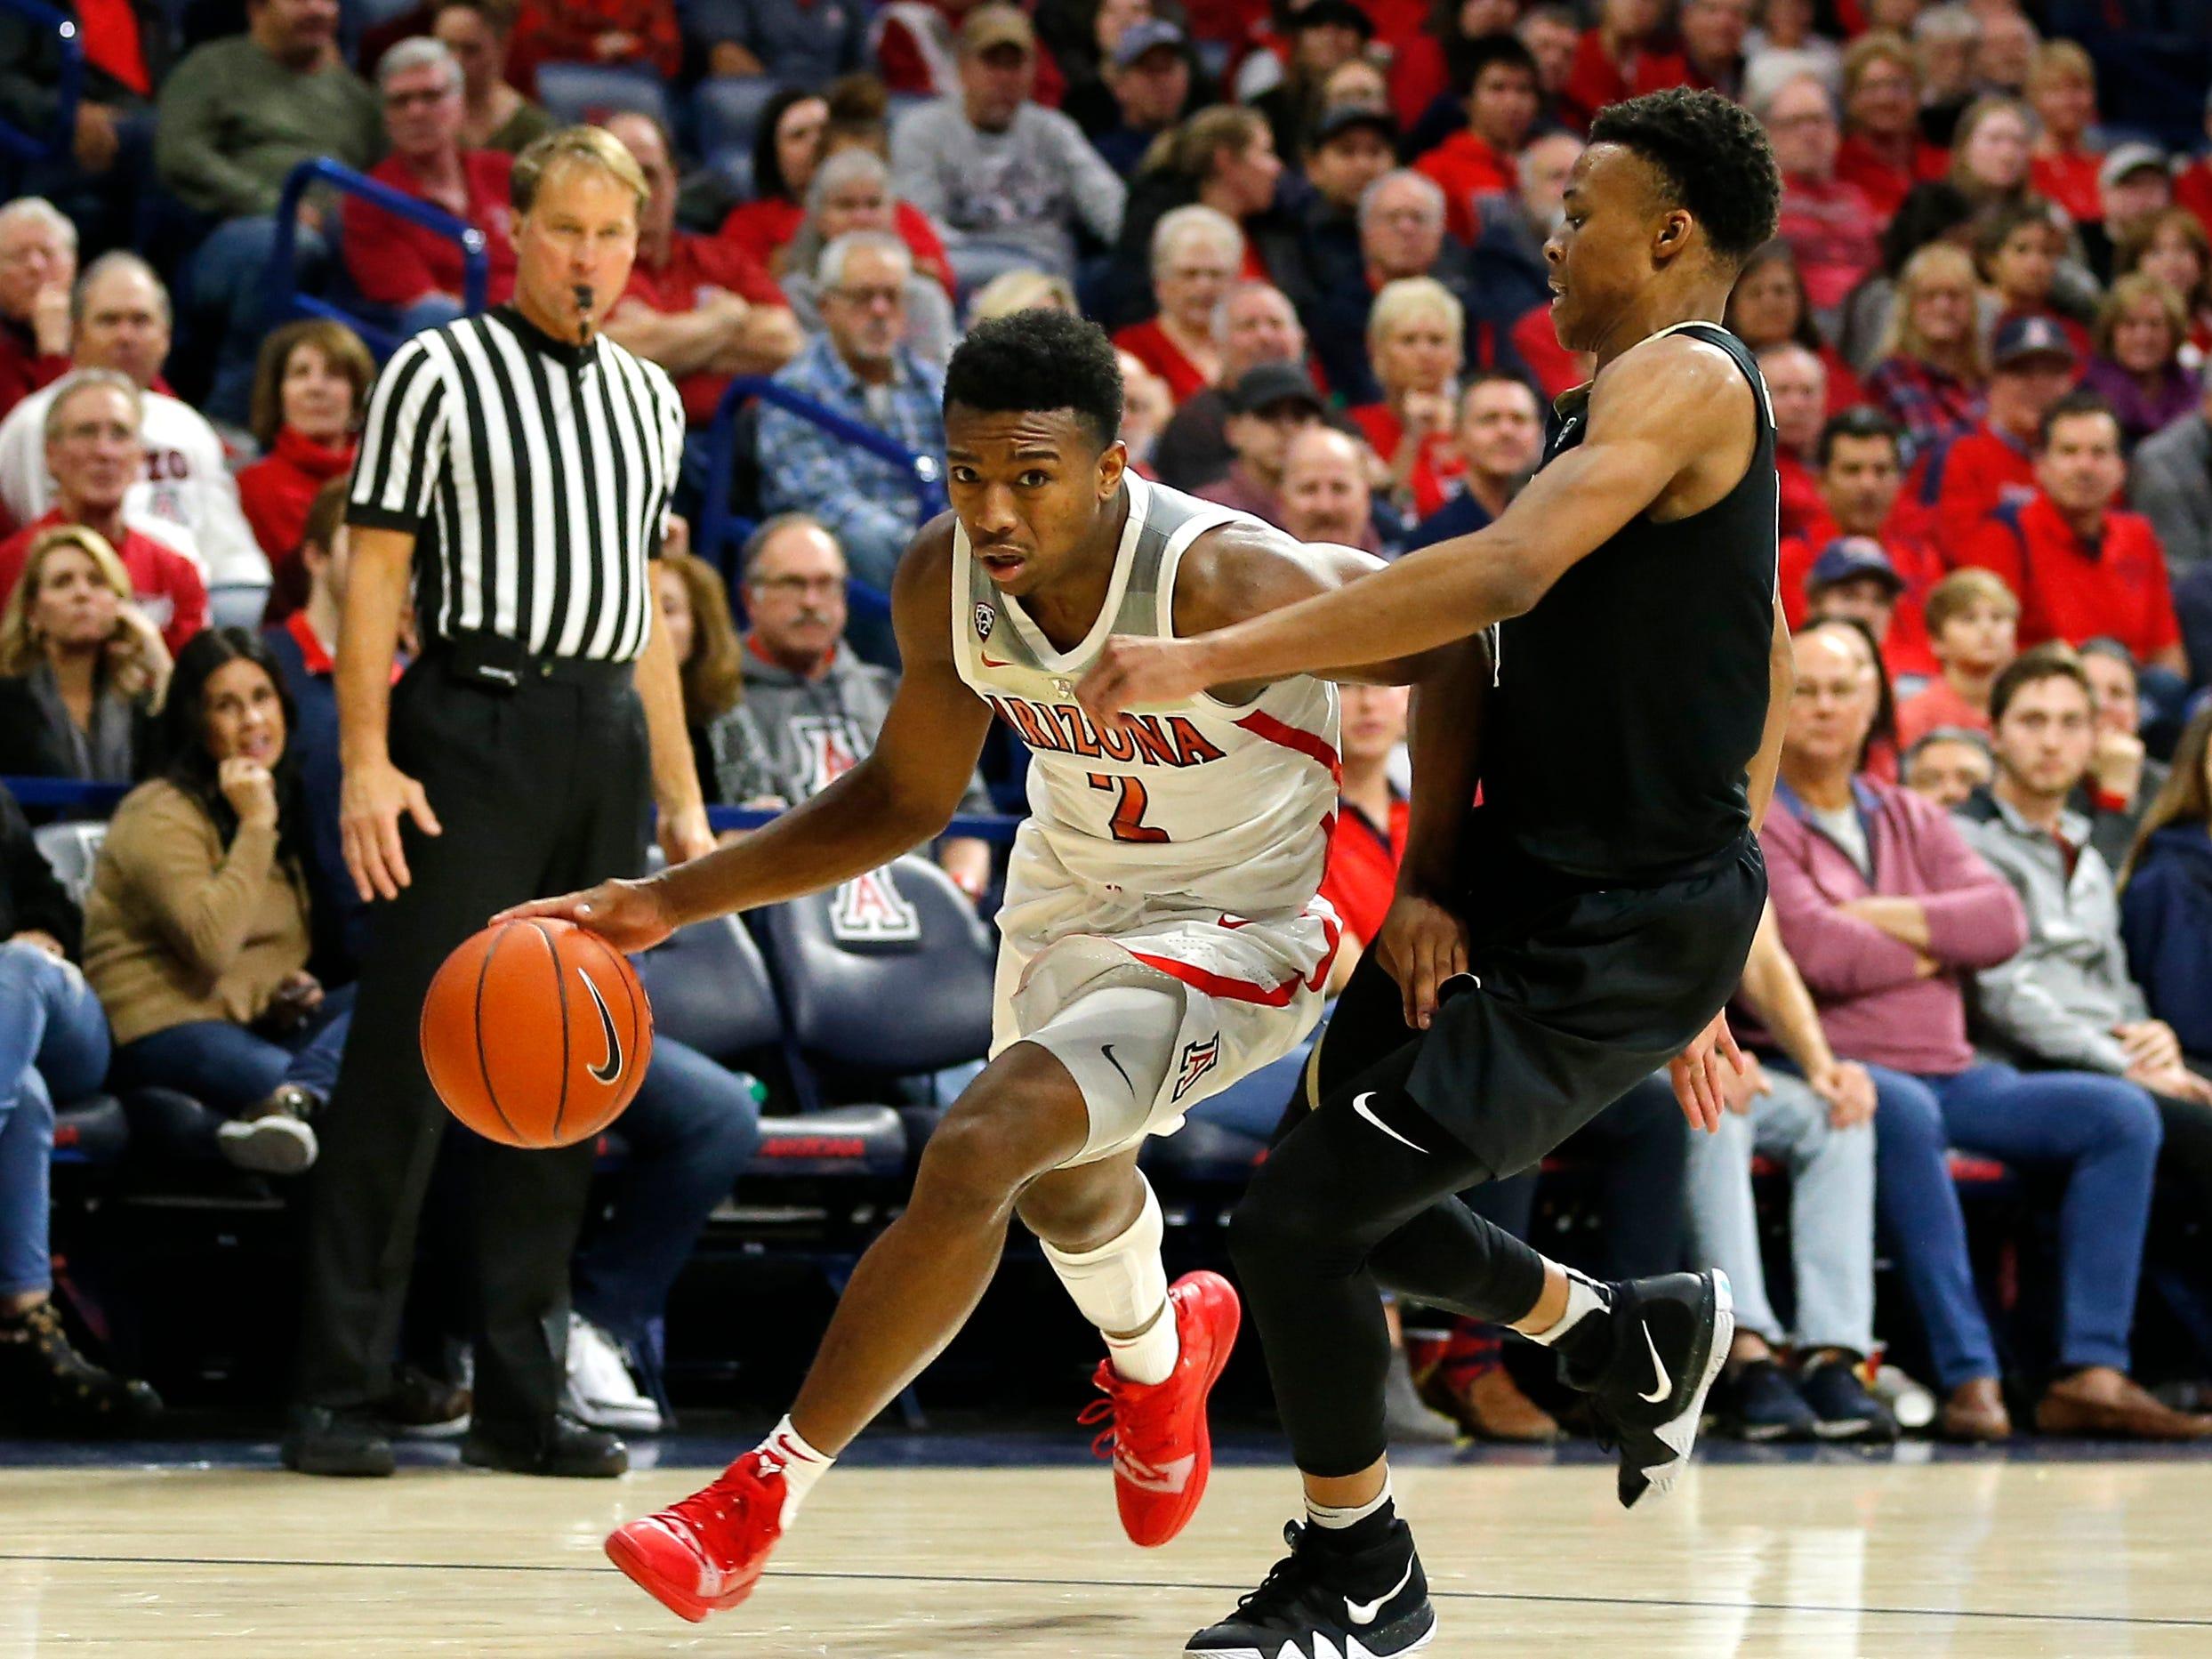 Arizona guard Brandon Williams (2) in the first half during an NCAA college basketball game against Colorado, Thursday, Jan. 3, 2019, in Tucson, Ariz. (AP Photo/Rick Scuteri)